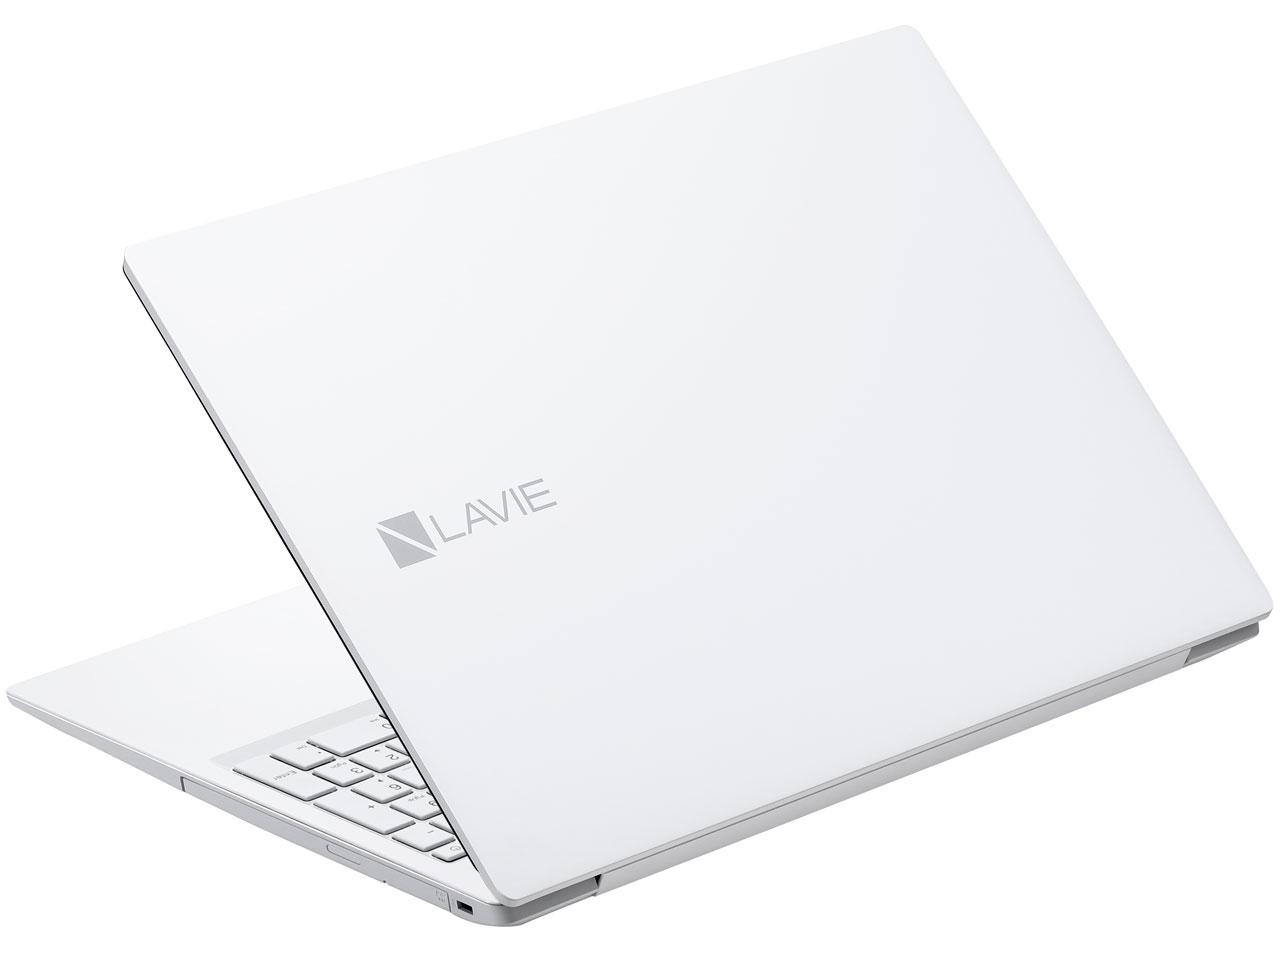 NEC PC-NS150NAW LAVIE Note Standard NS150/NAW カームホワイト(PC-NS150NAW)【smtb-s】